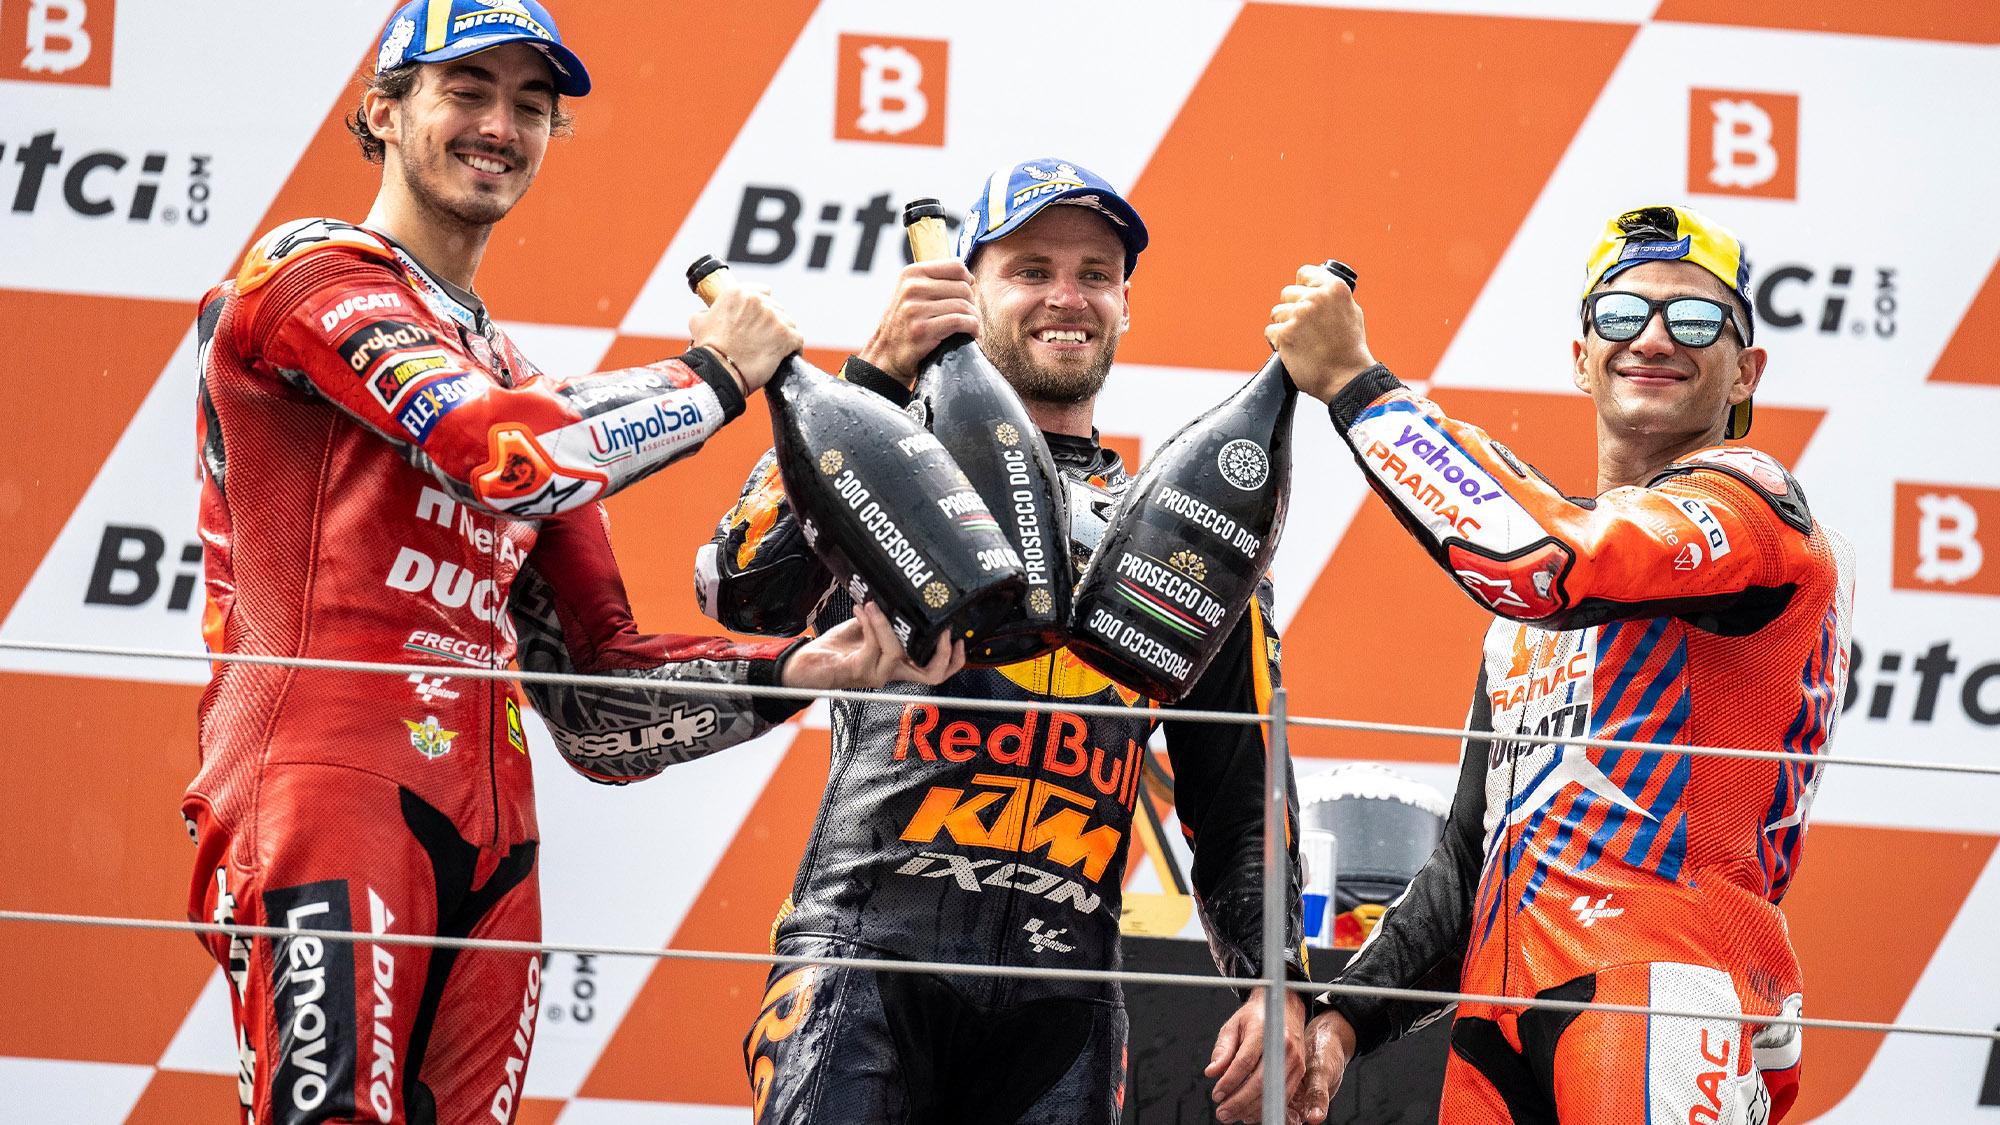 Brad Binder Pecco Bagnaia and Jorge Martin on the pdoum after the 2021 MotoGP Austrian GP